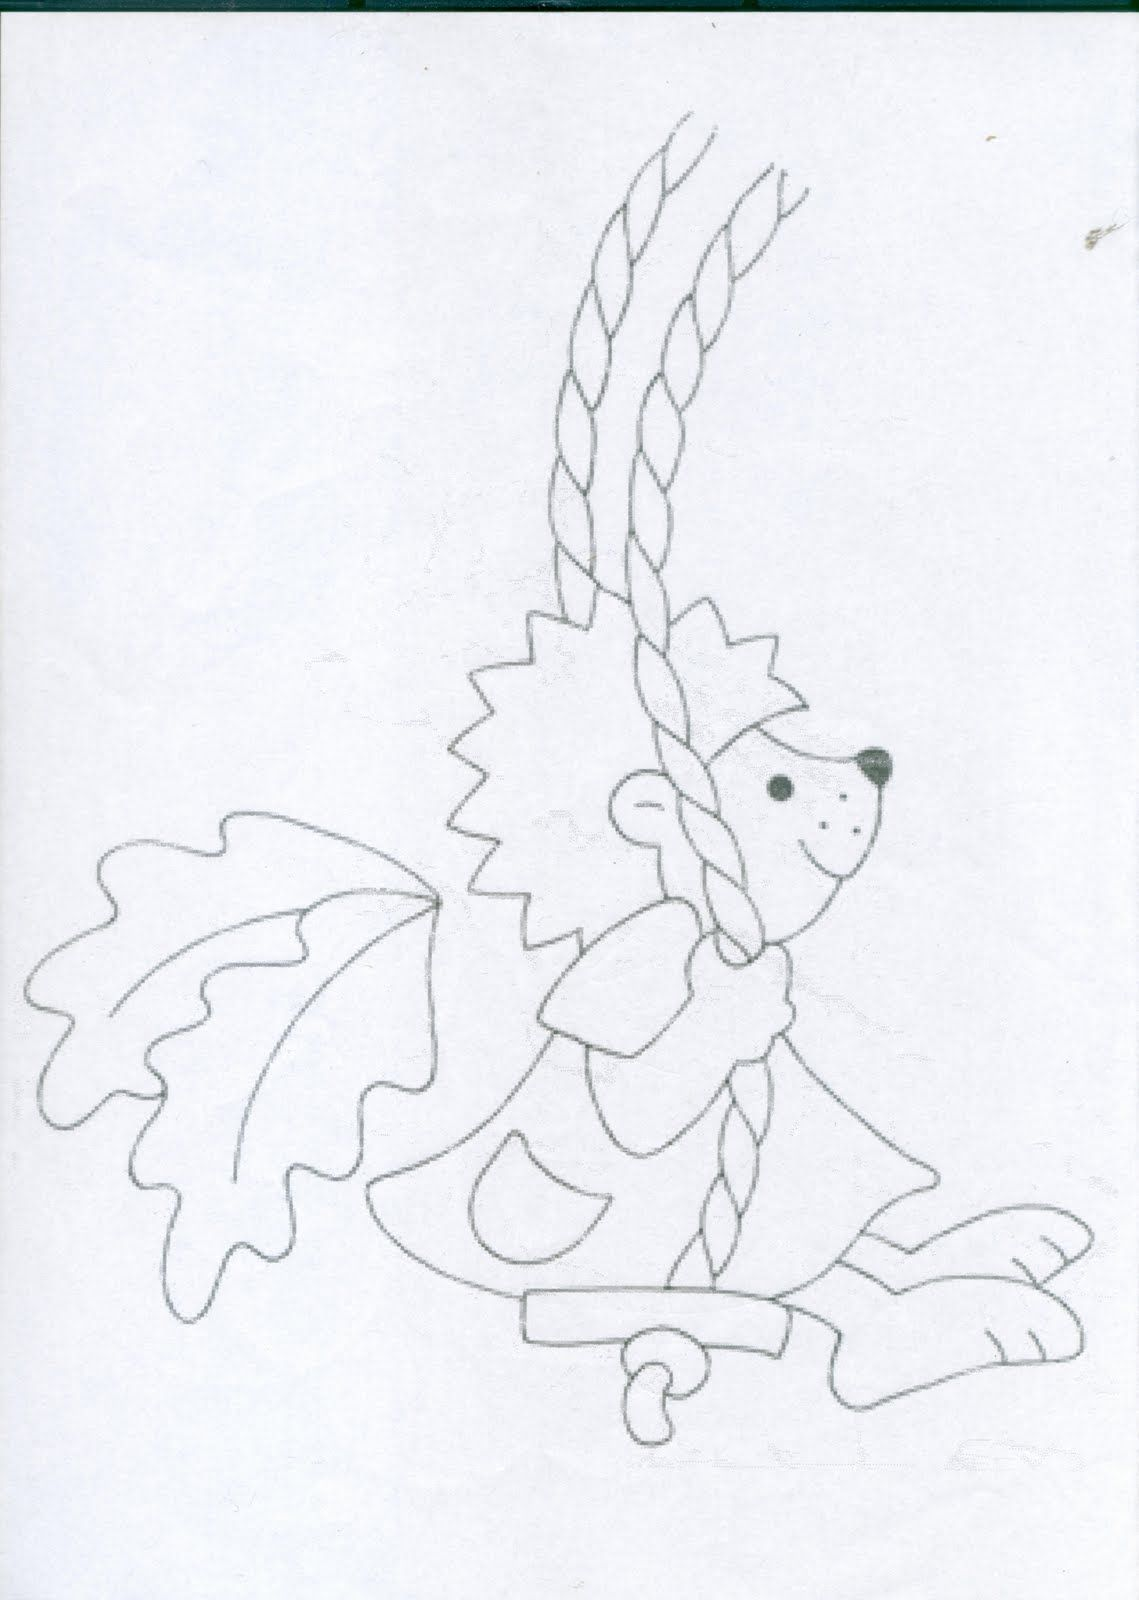 Mesetarhaz Hintazo Molus Es Suni Fall Paper Crafts Coloring Pages Applique Templates